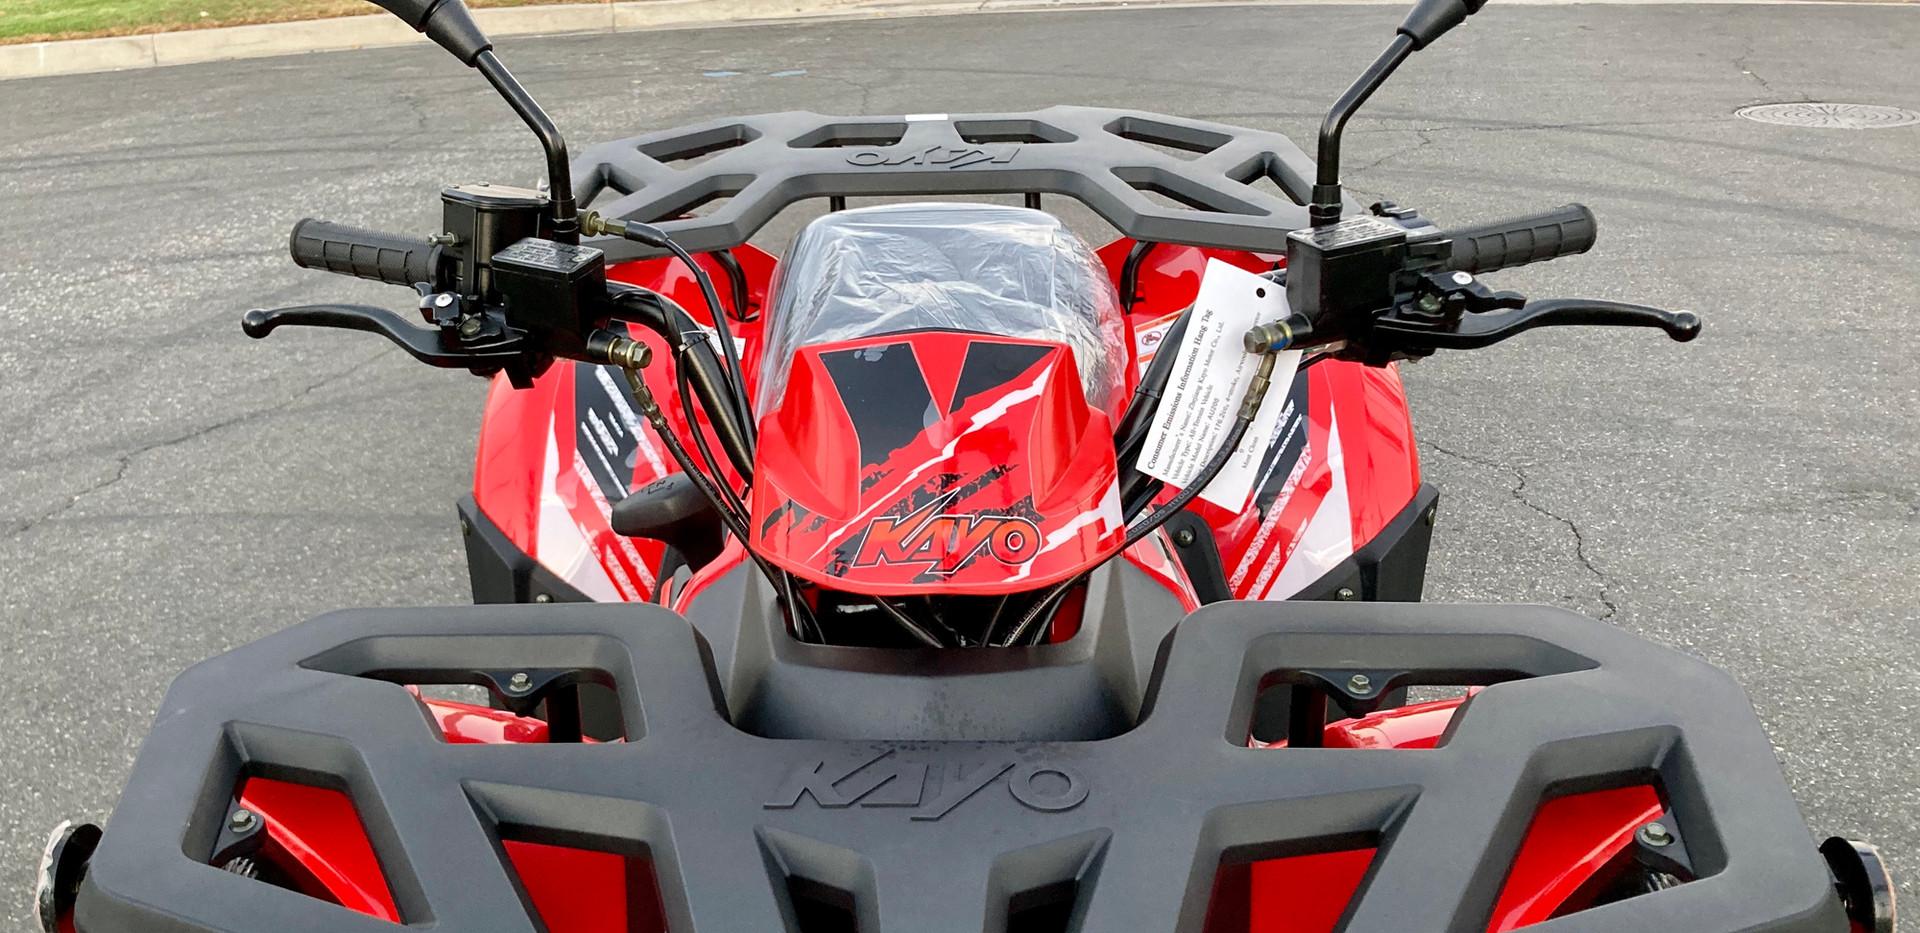 2020 Kayo Bull 200 (Red) (12).JPG